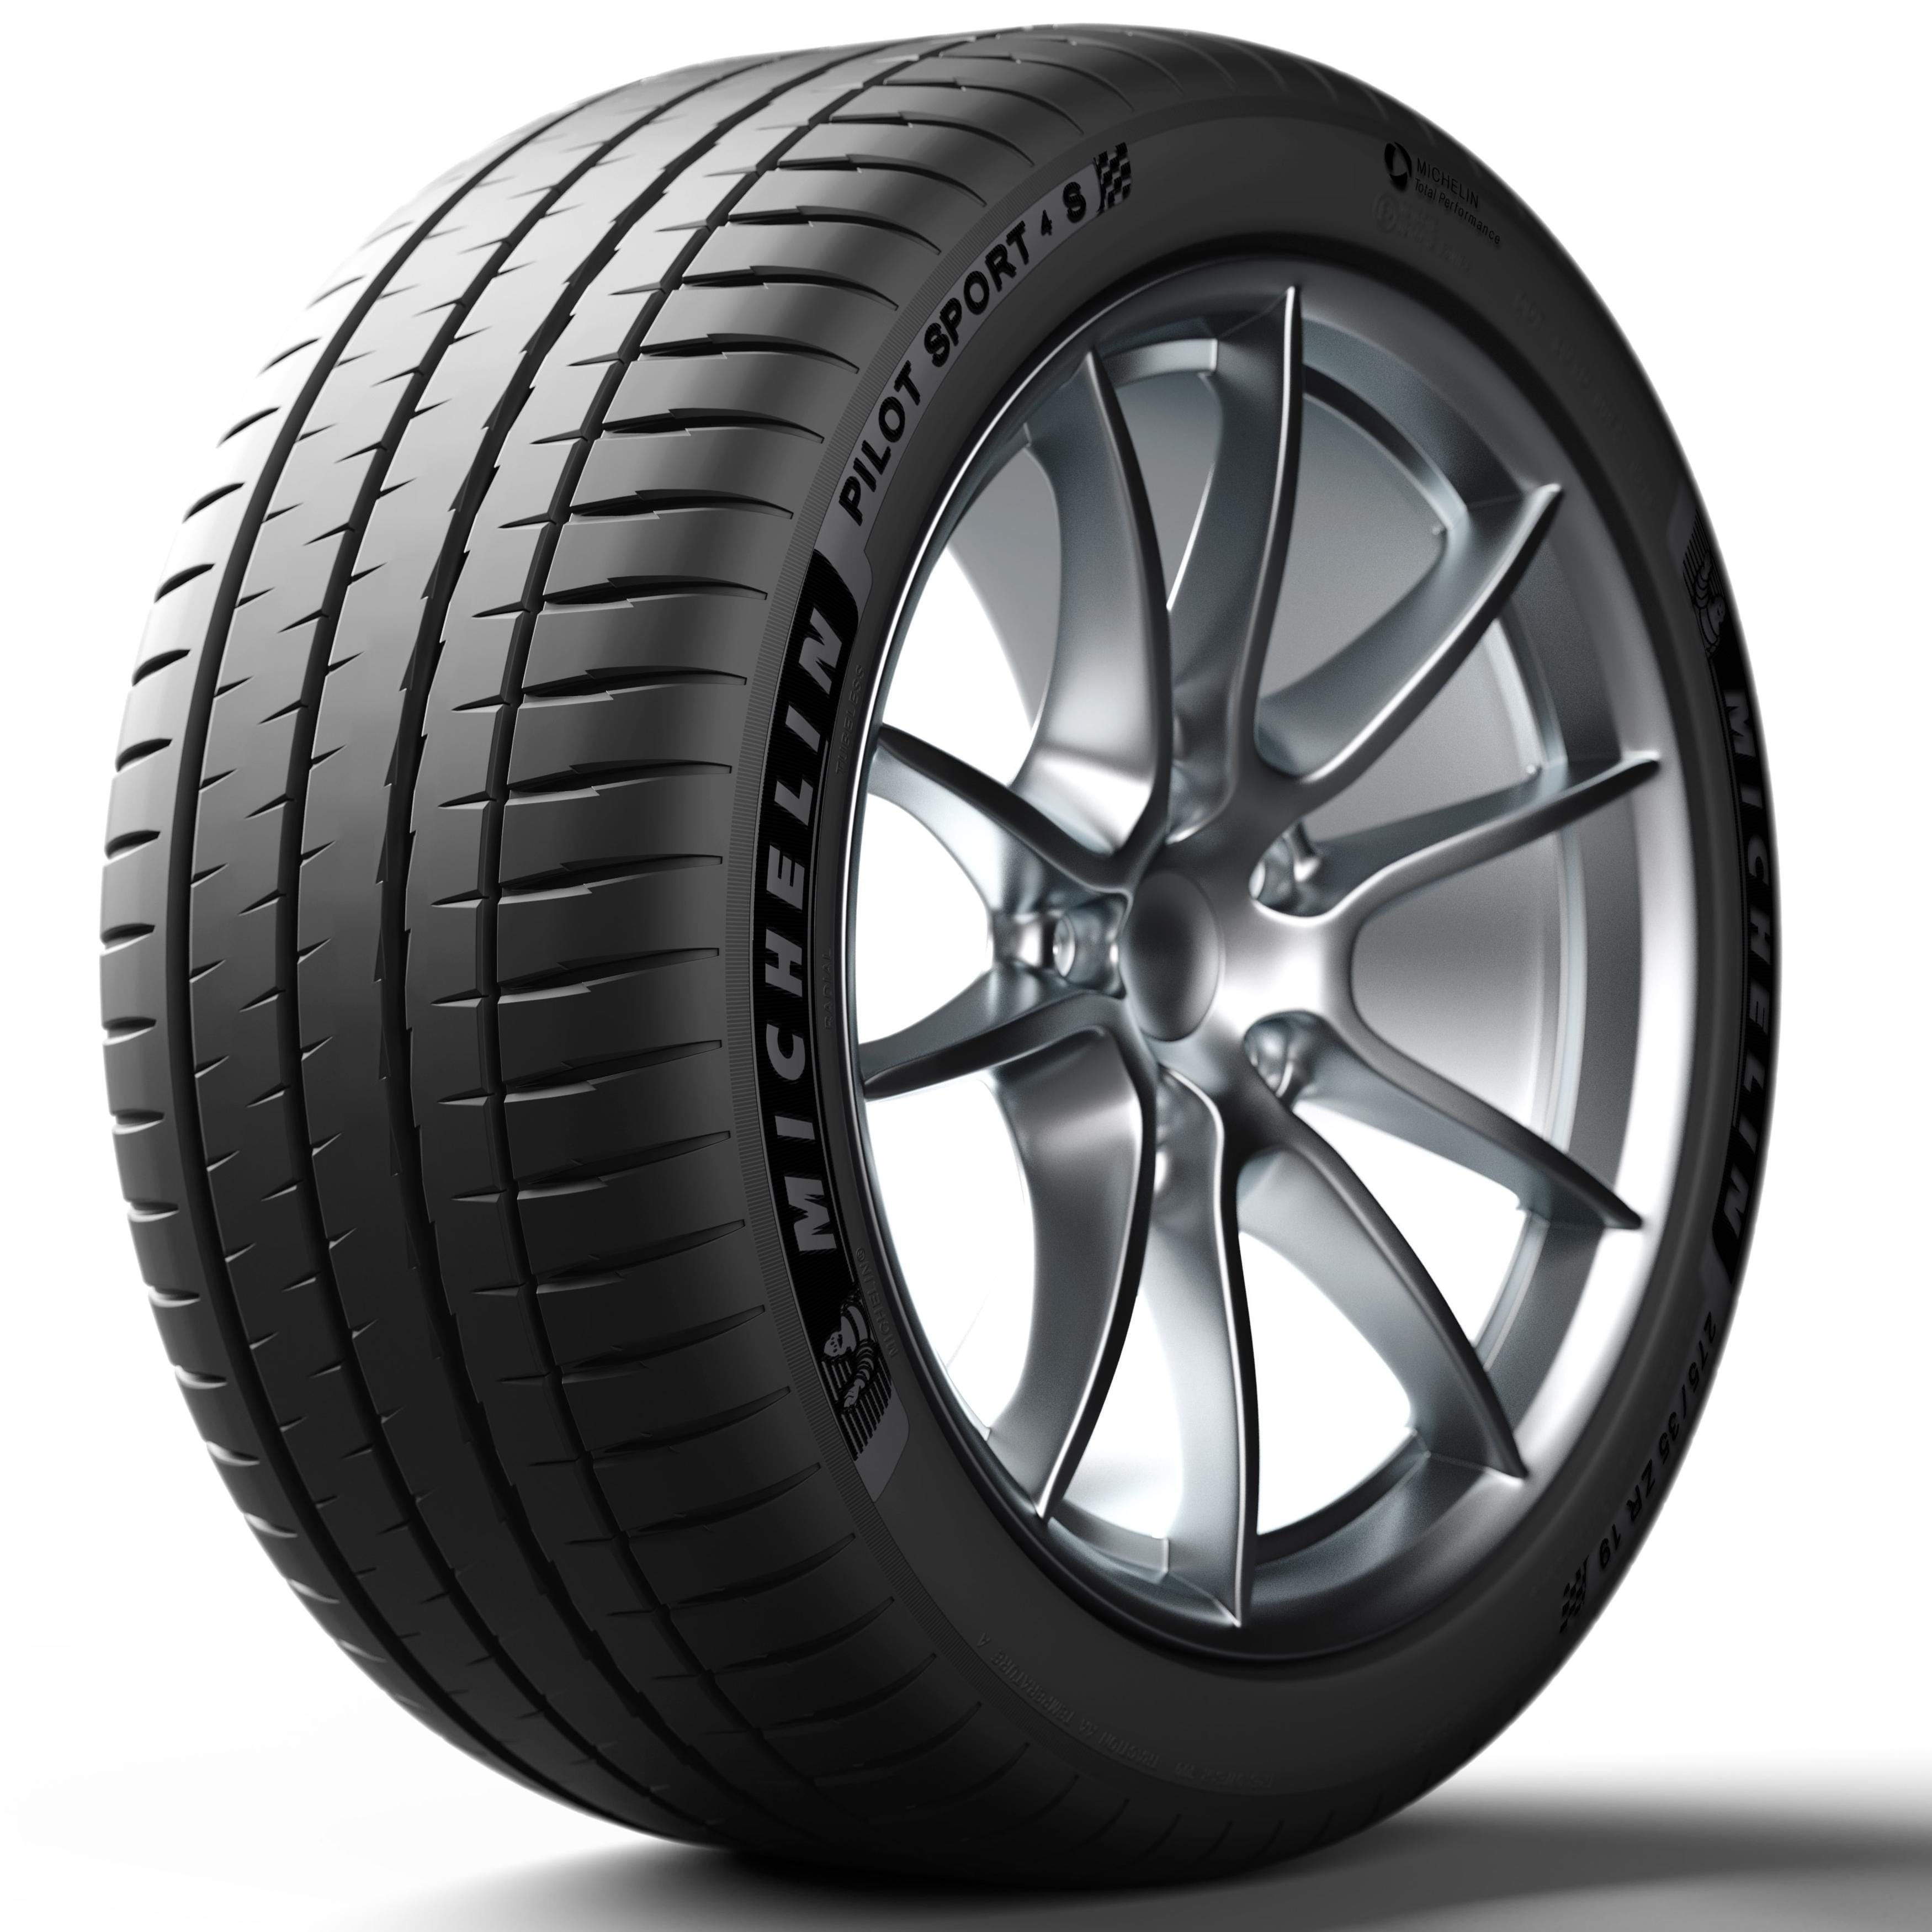 Шины Michelin Pilot Sport 4 S 265/40R21 105 Y